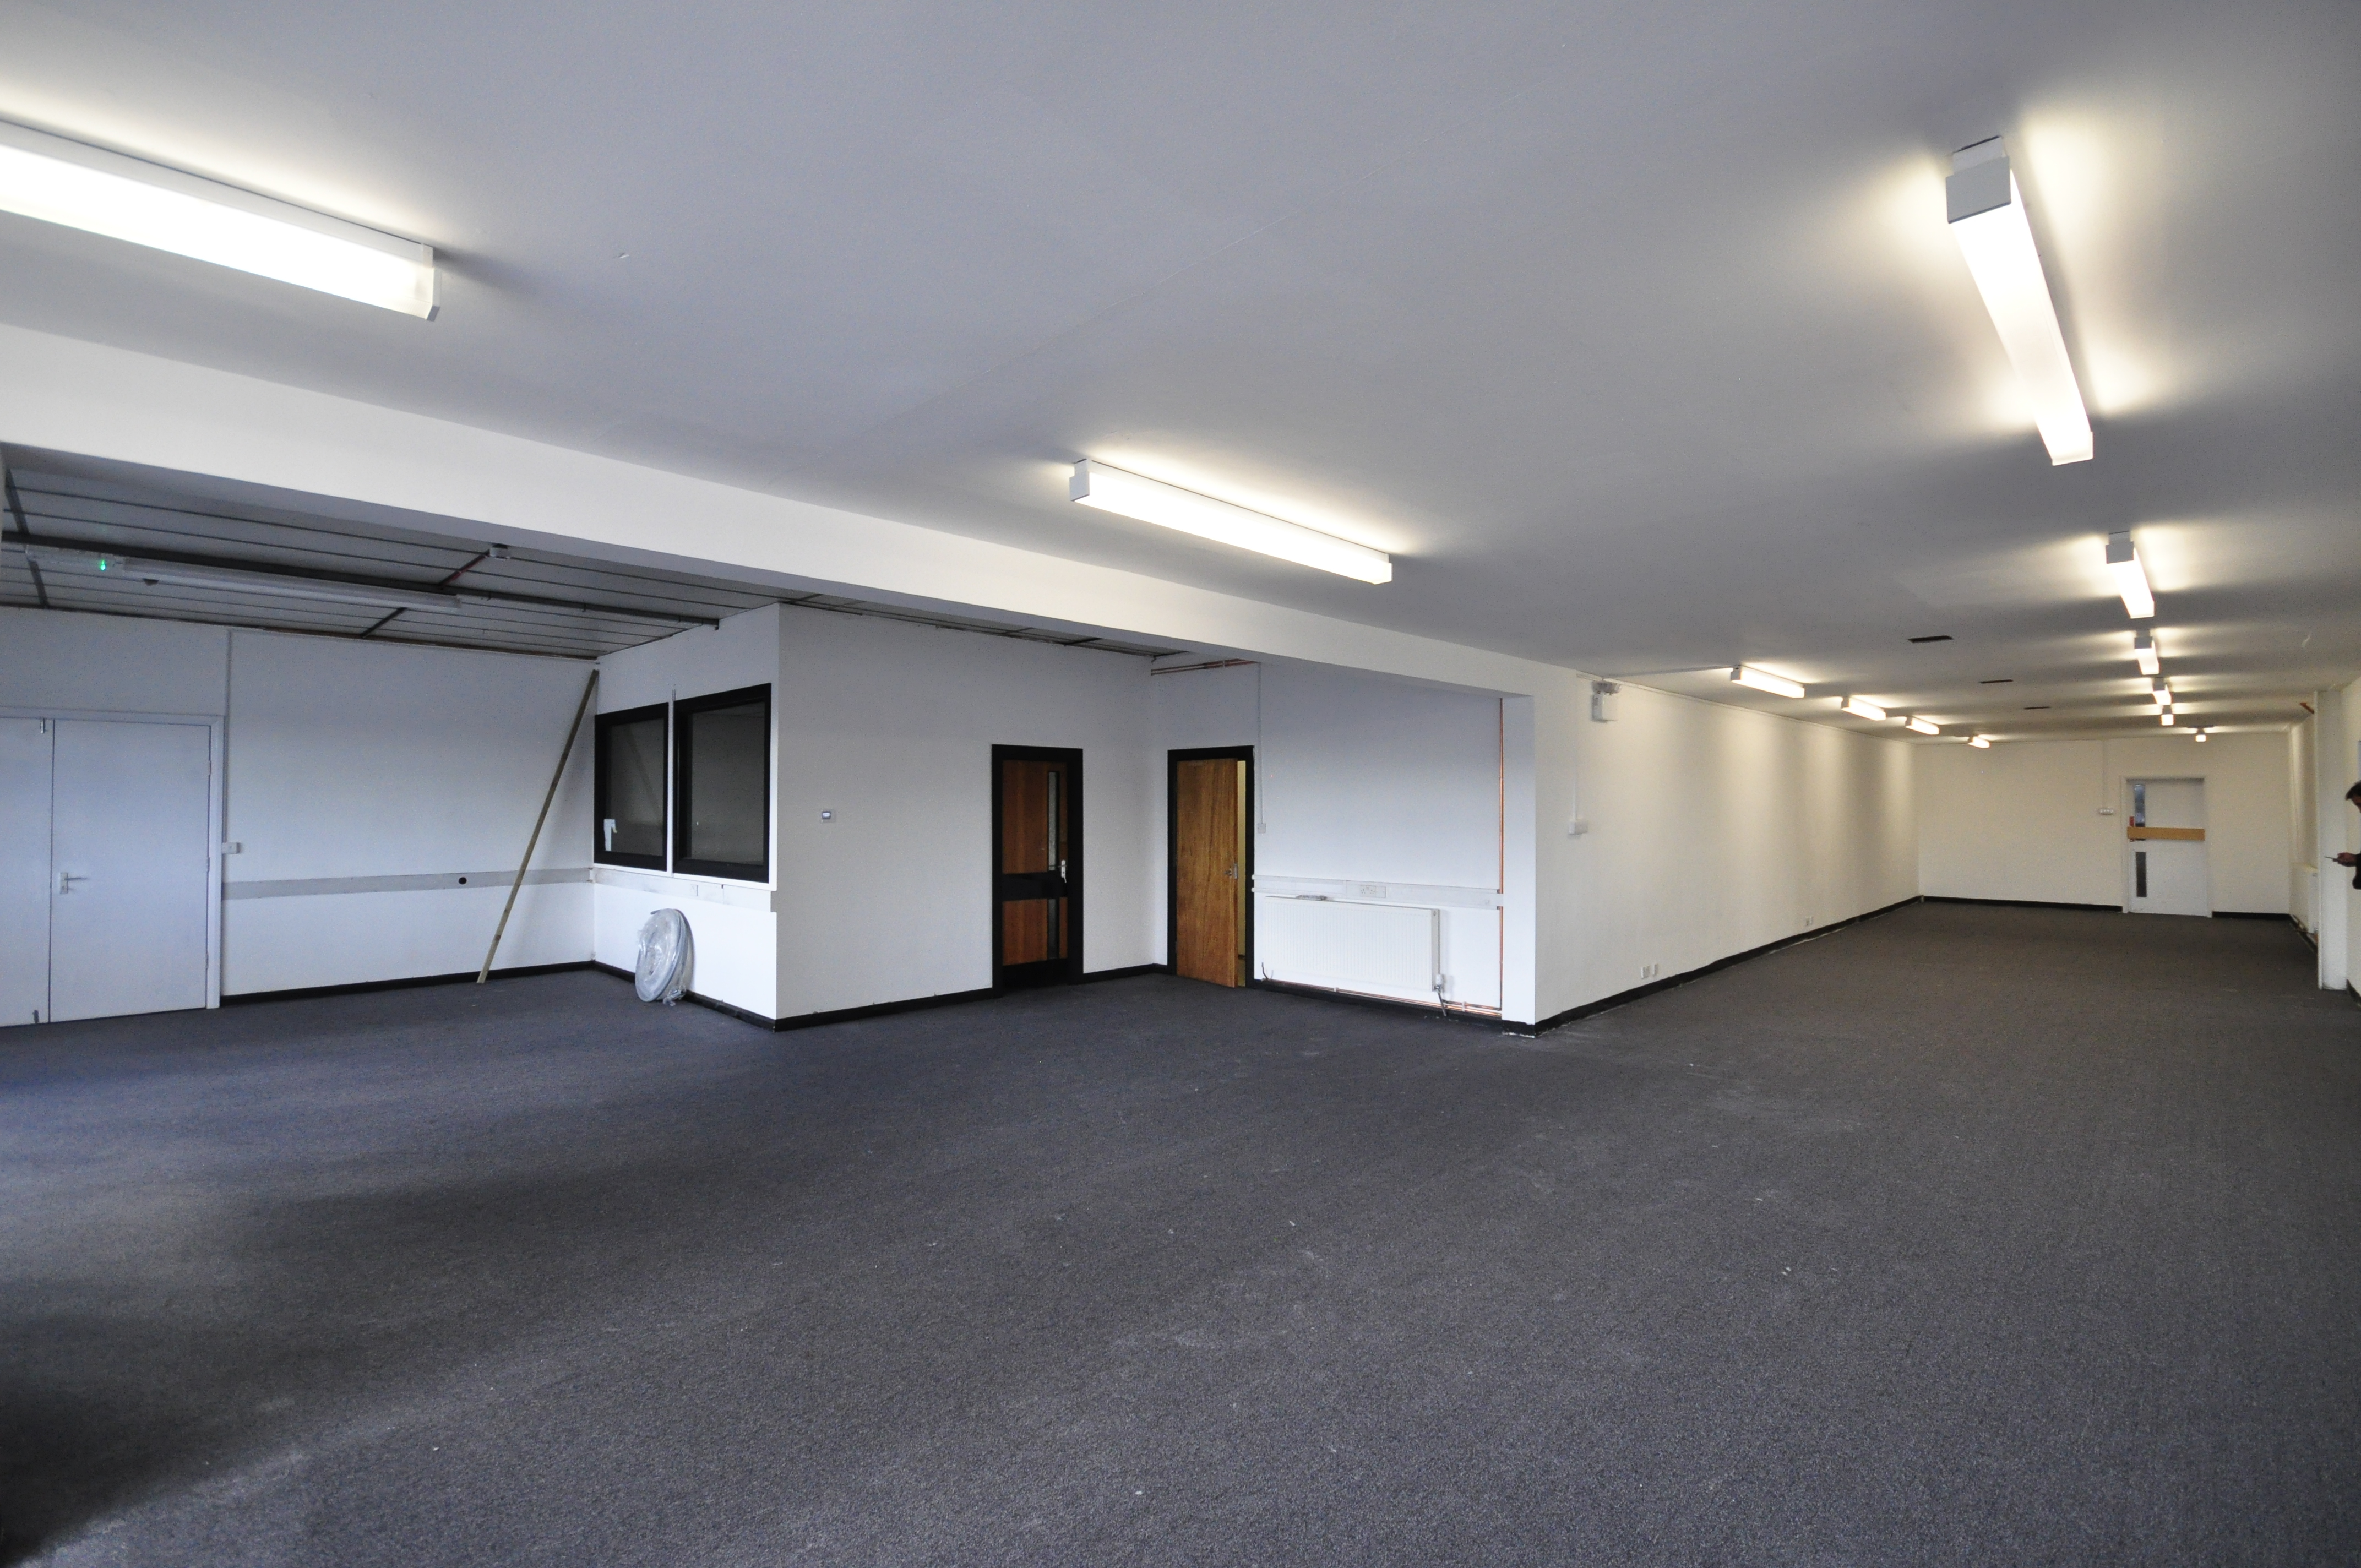 Neasden Warehouse, NW10 2XA - 2nd Floor Offices - Image 15